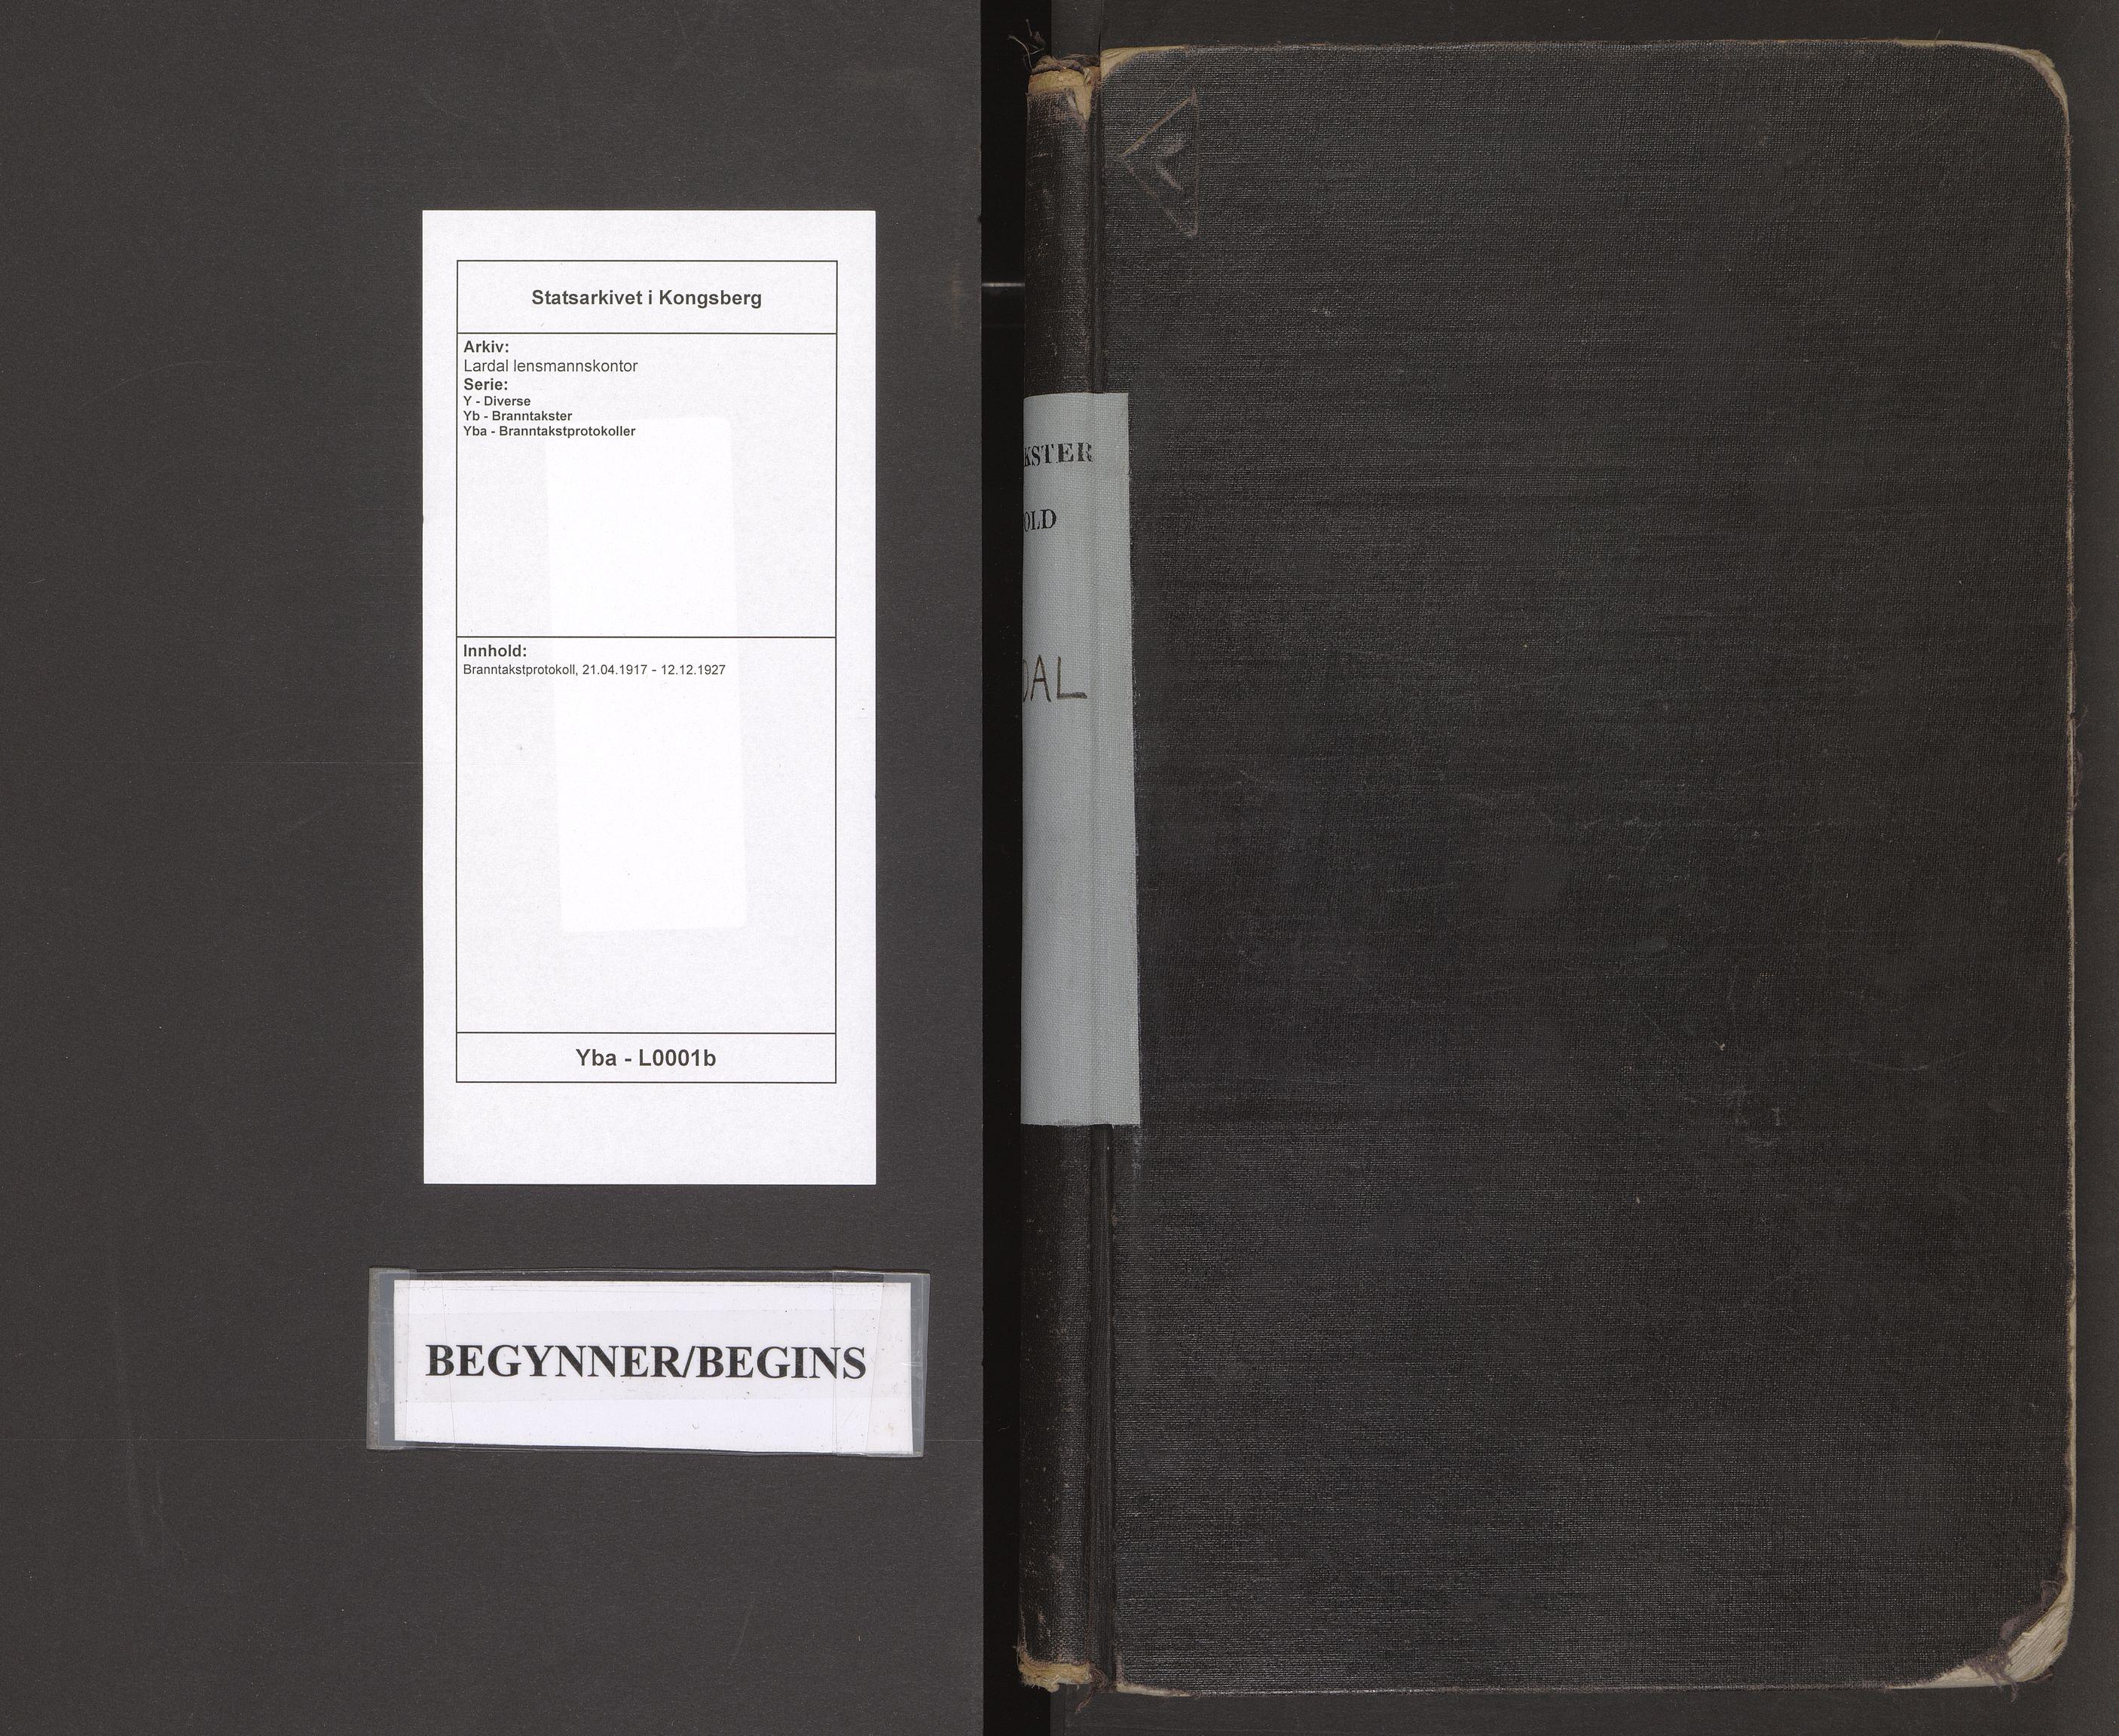 SAKO, Lardal lensmannskontor, Y/Yb/Yba/L0001b: Branntakstprotokoll, 1917-1927